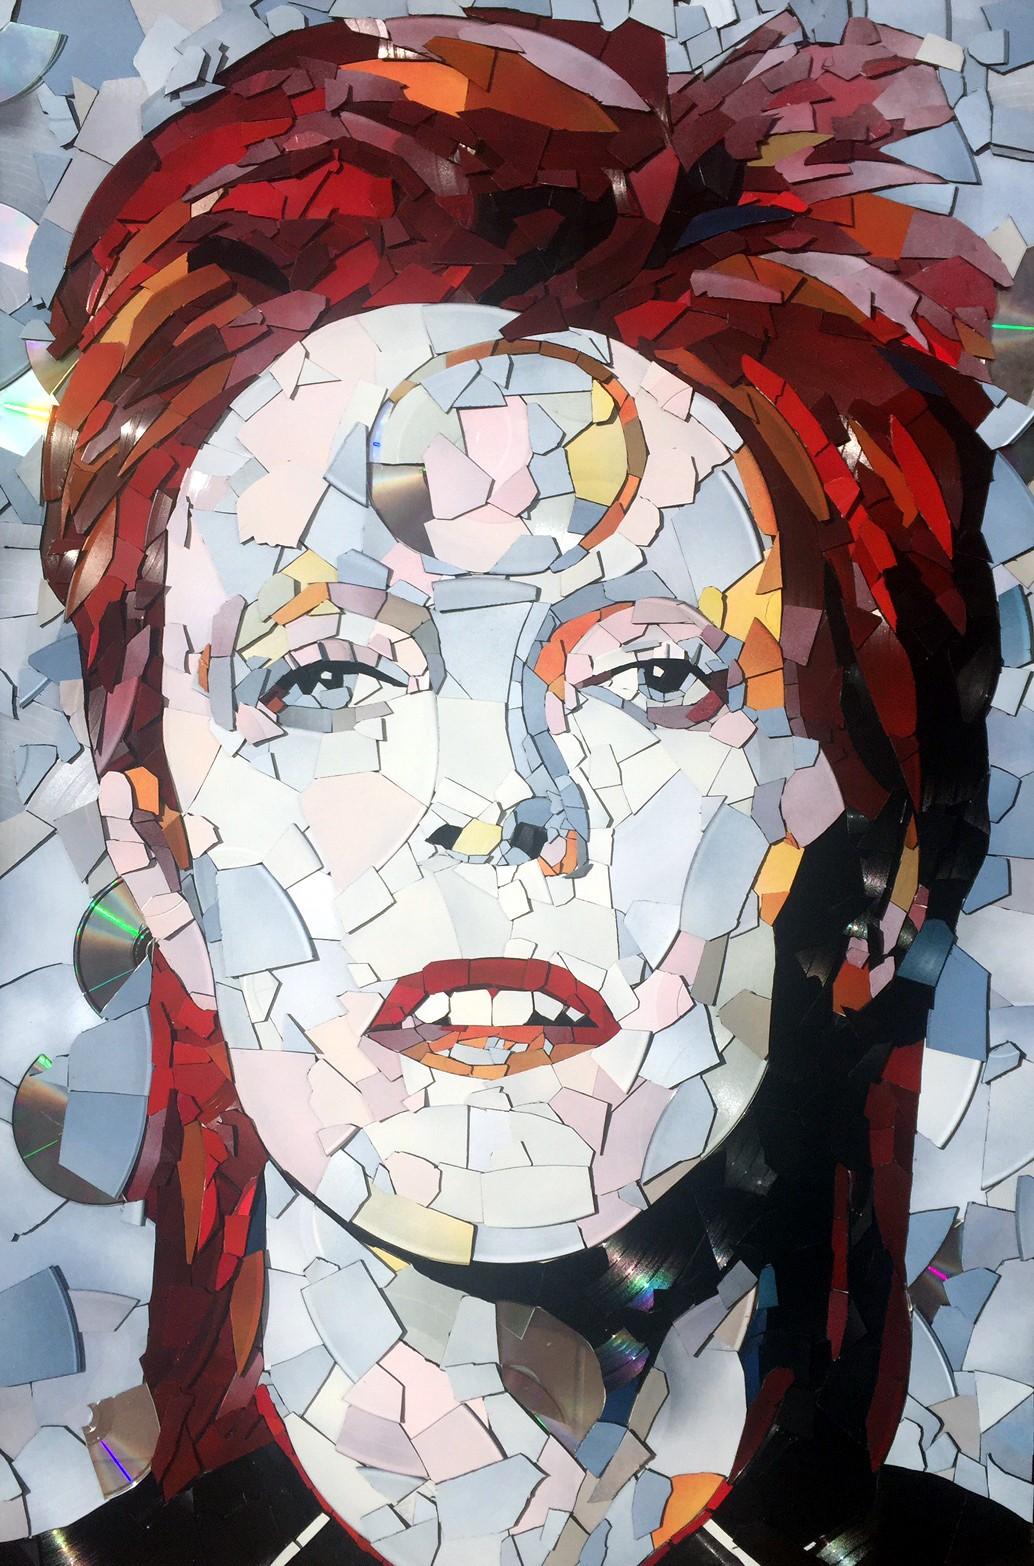 lc__bowie-1-ziggy-stardust-by-ed-chapman-1